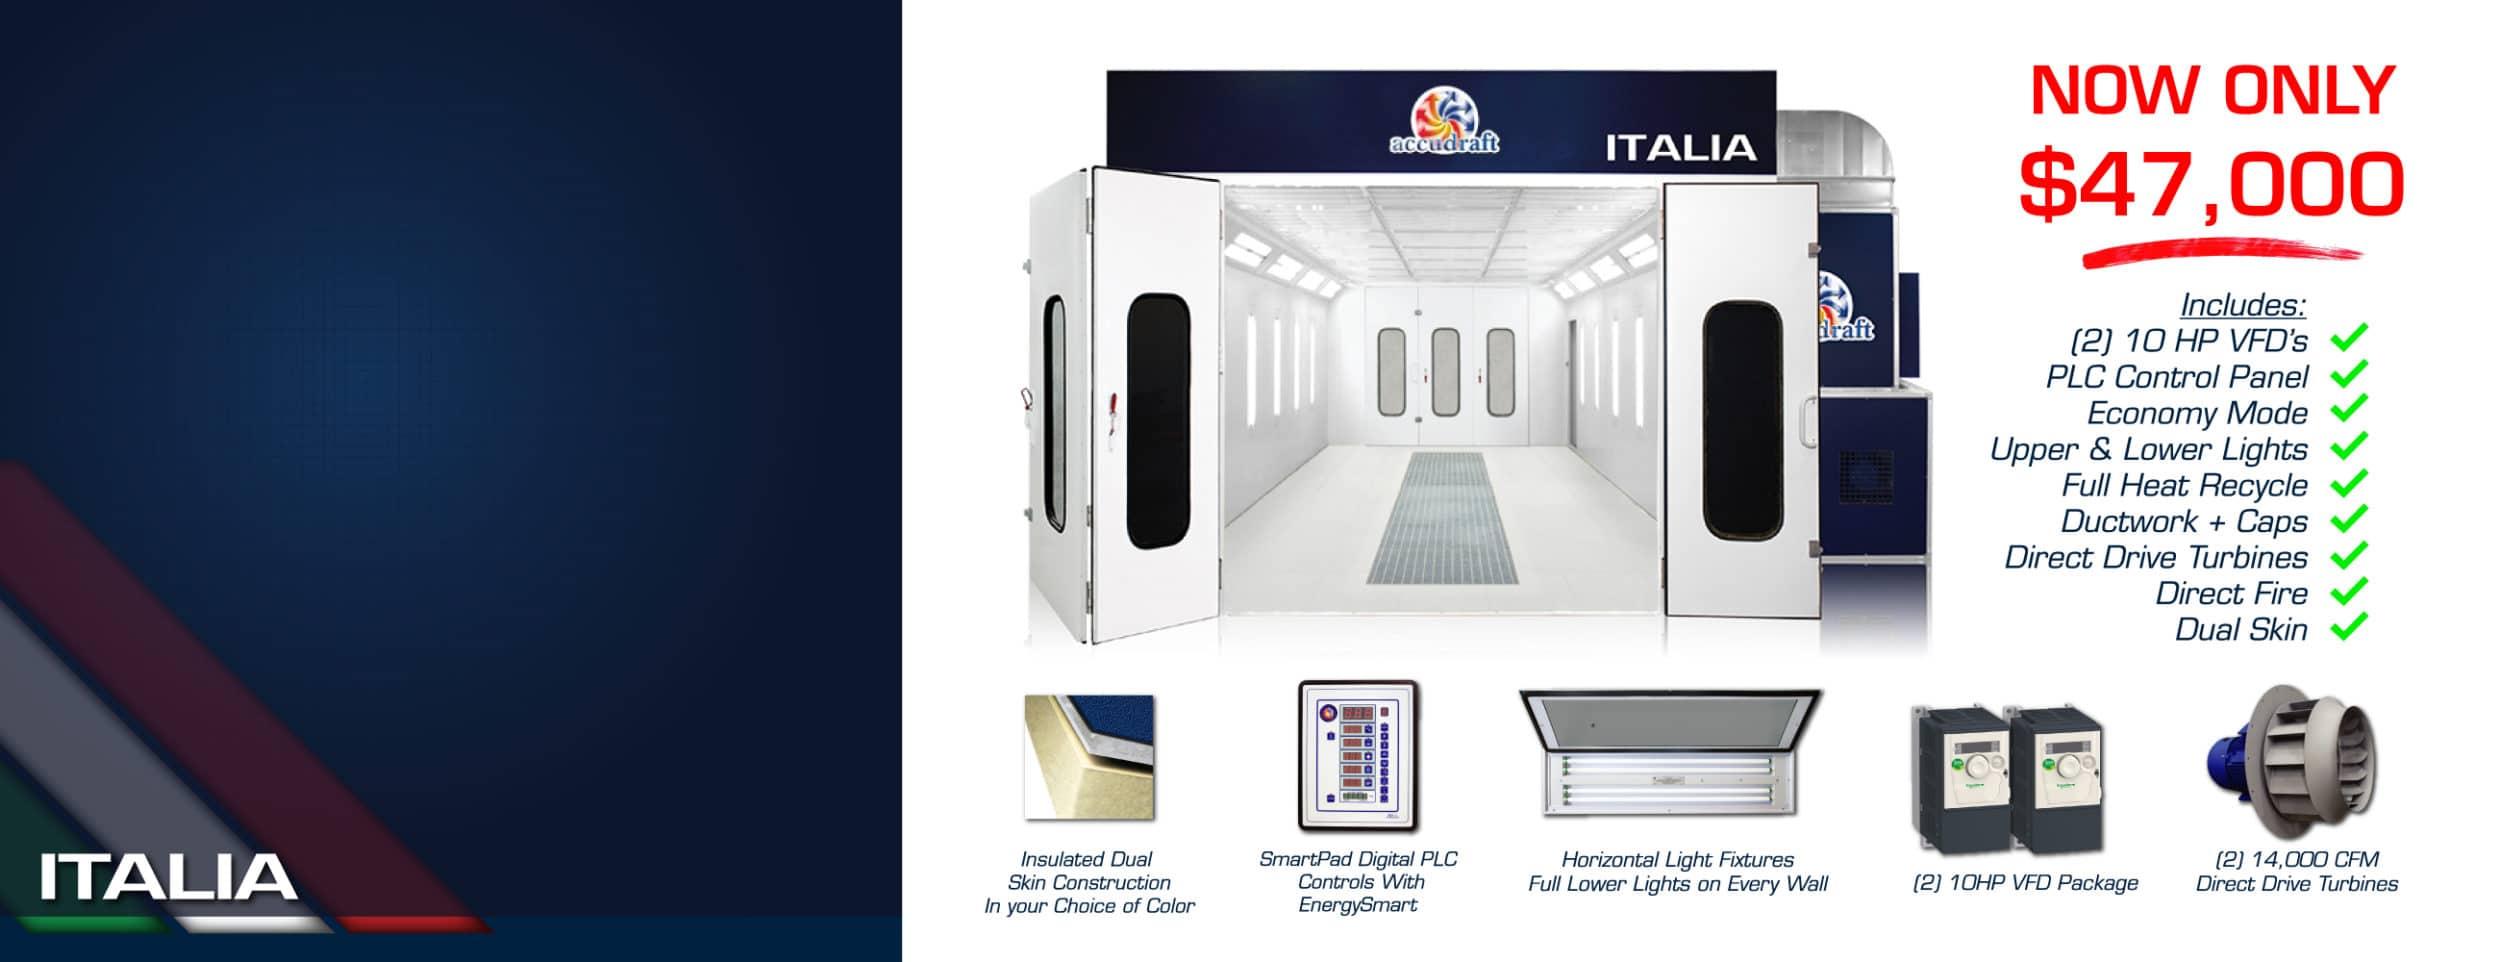 ITALIA-Paint Booth